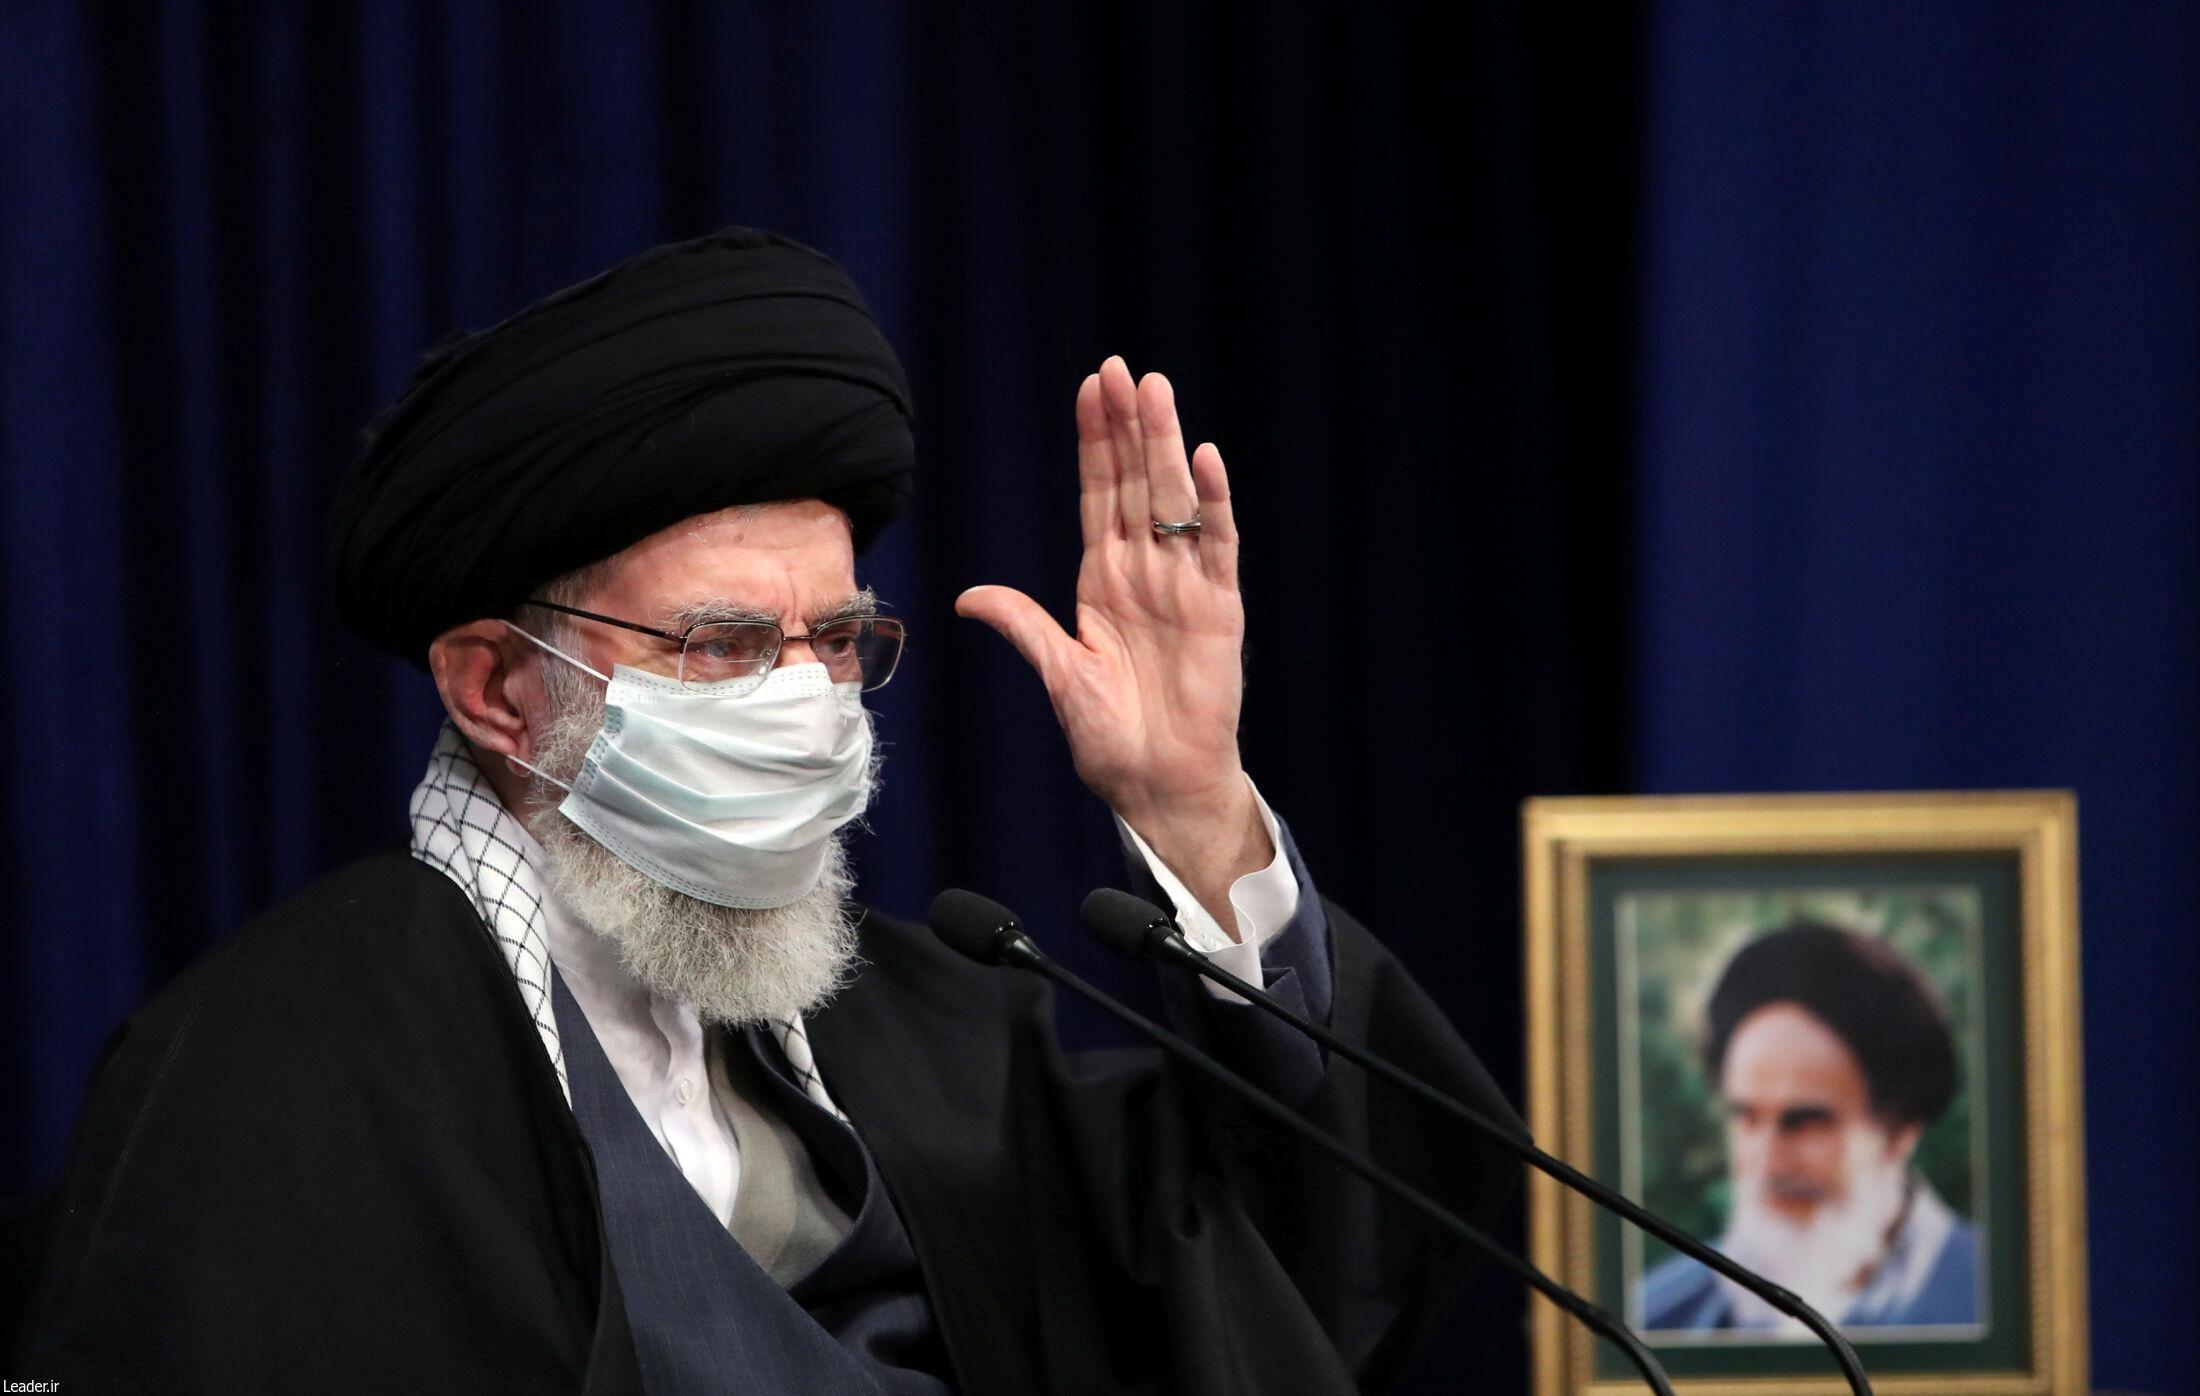 Iran's Supreme Leader Ayatollah Ali Khamenei wears a mask during a virtual speech, in Tehran, Iran February 17, 2021.